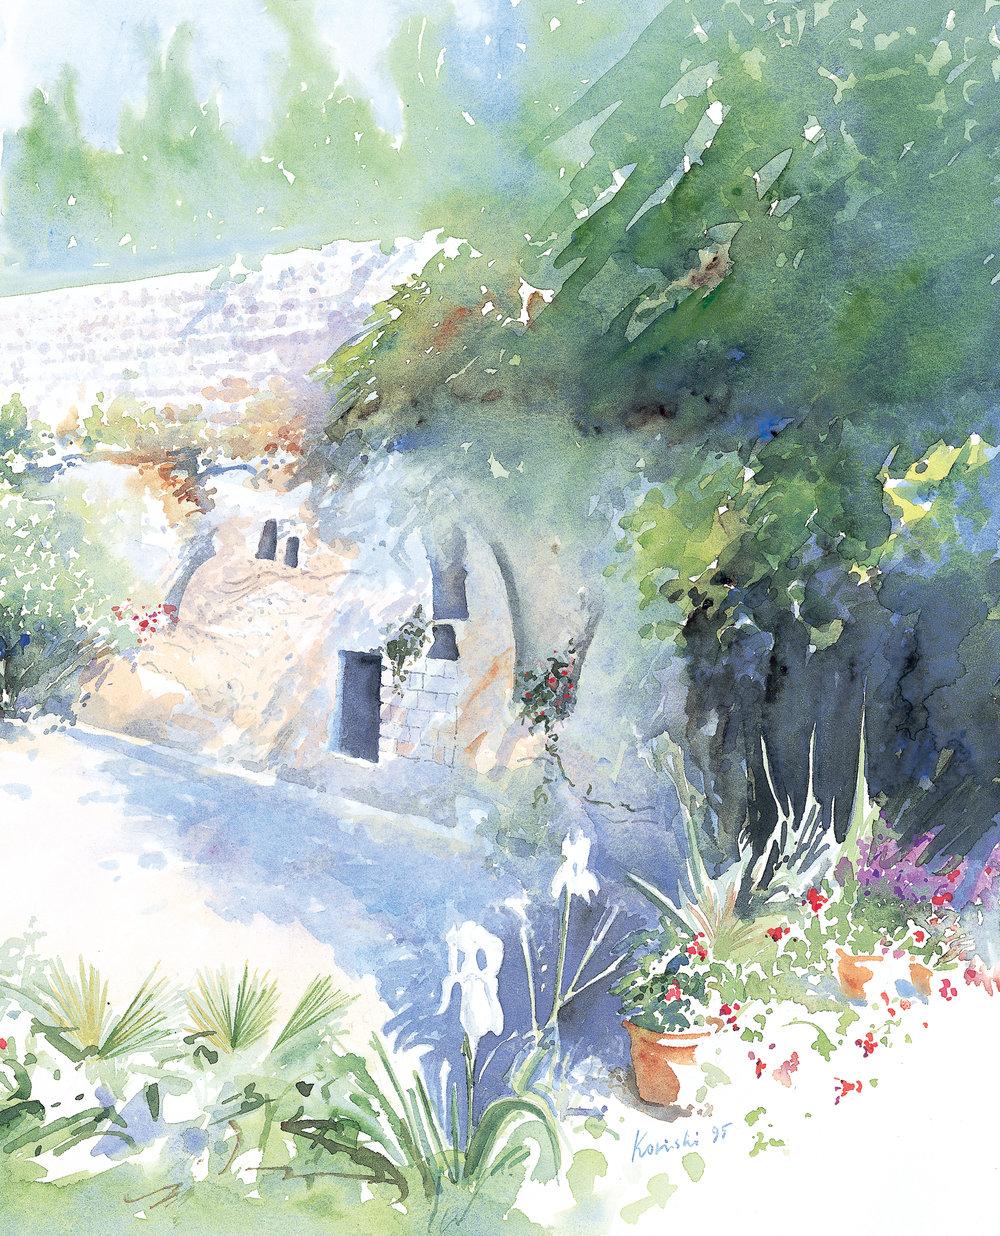 Empty Sepulchre, Garden Tomb